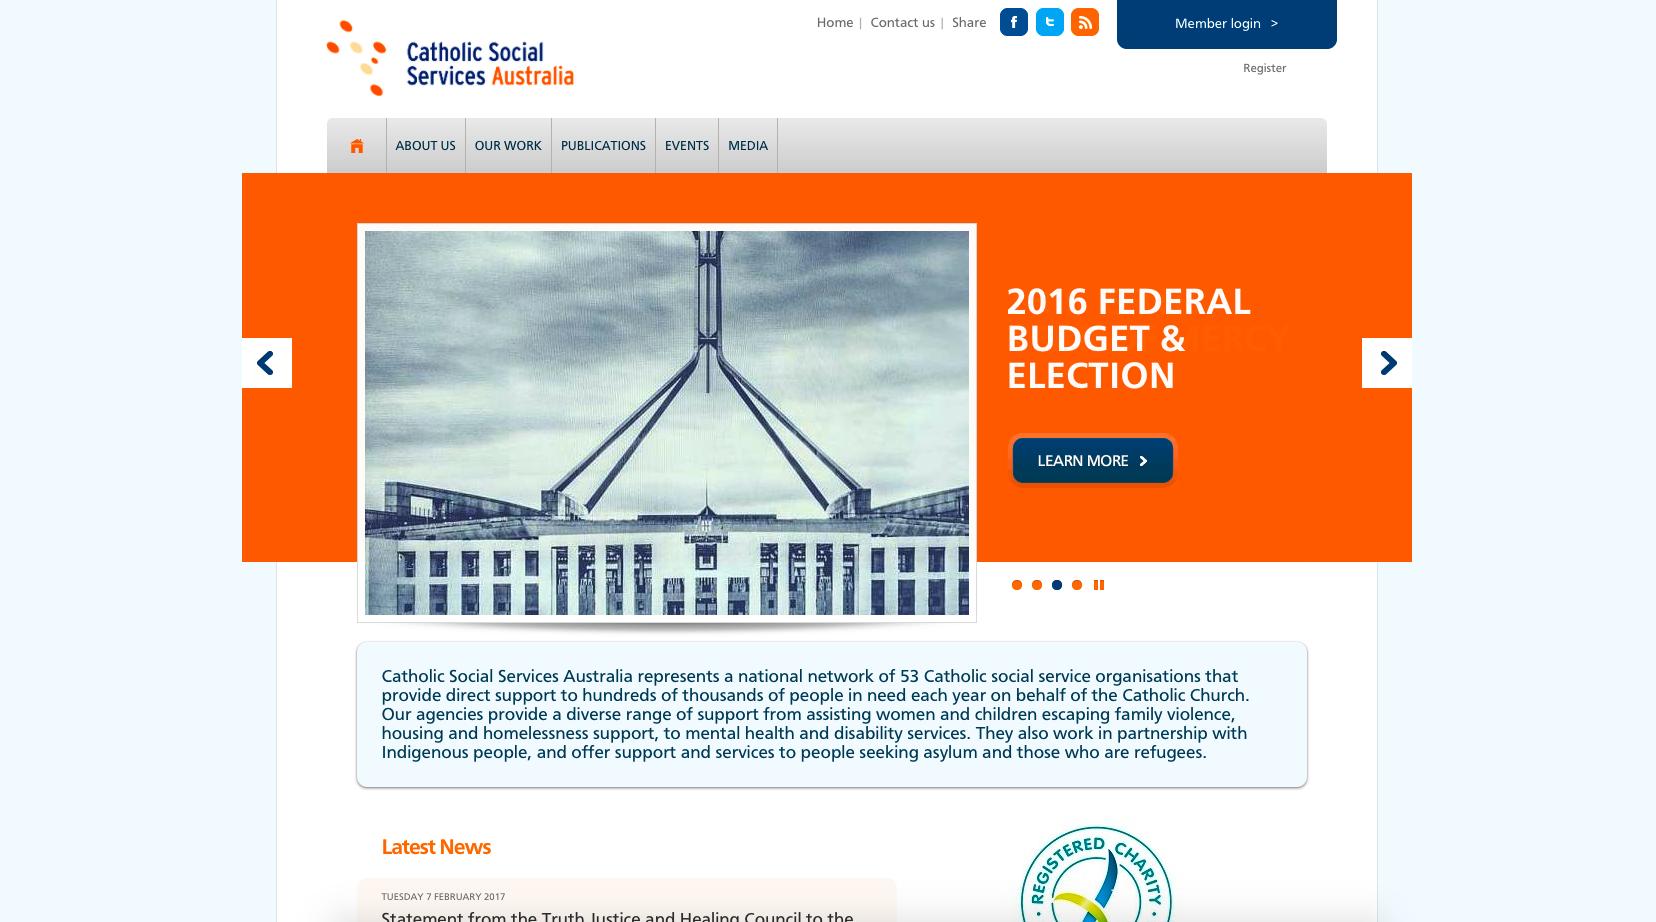 Catholic Social Services Australia